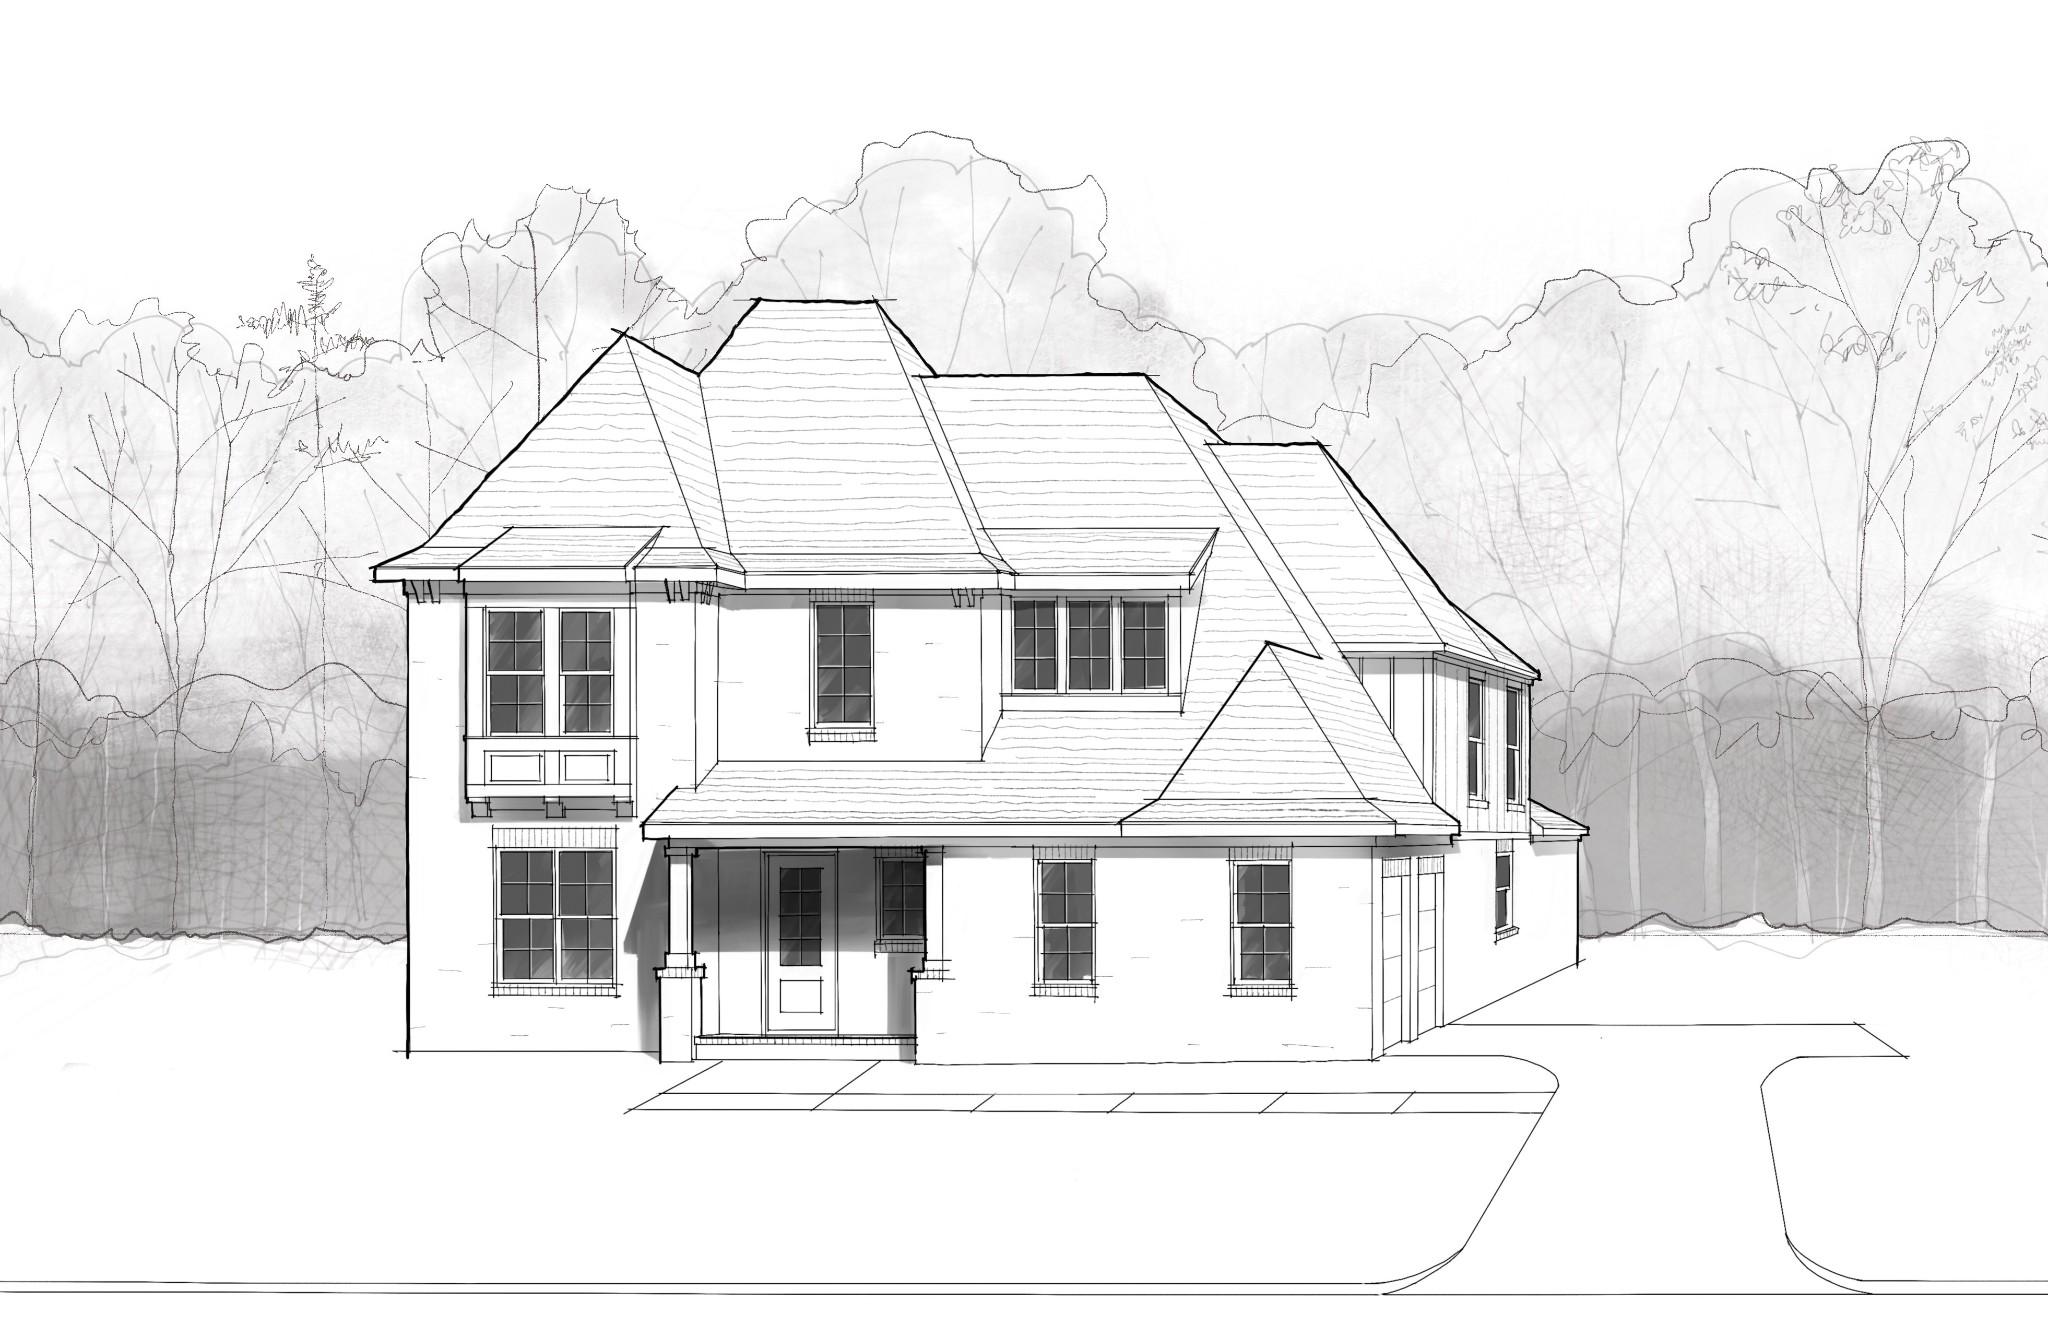 4026 Planters Trail #605, Mount Juliet, TN 37122 - Mount Juliet, TN real estate listing